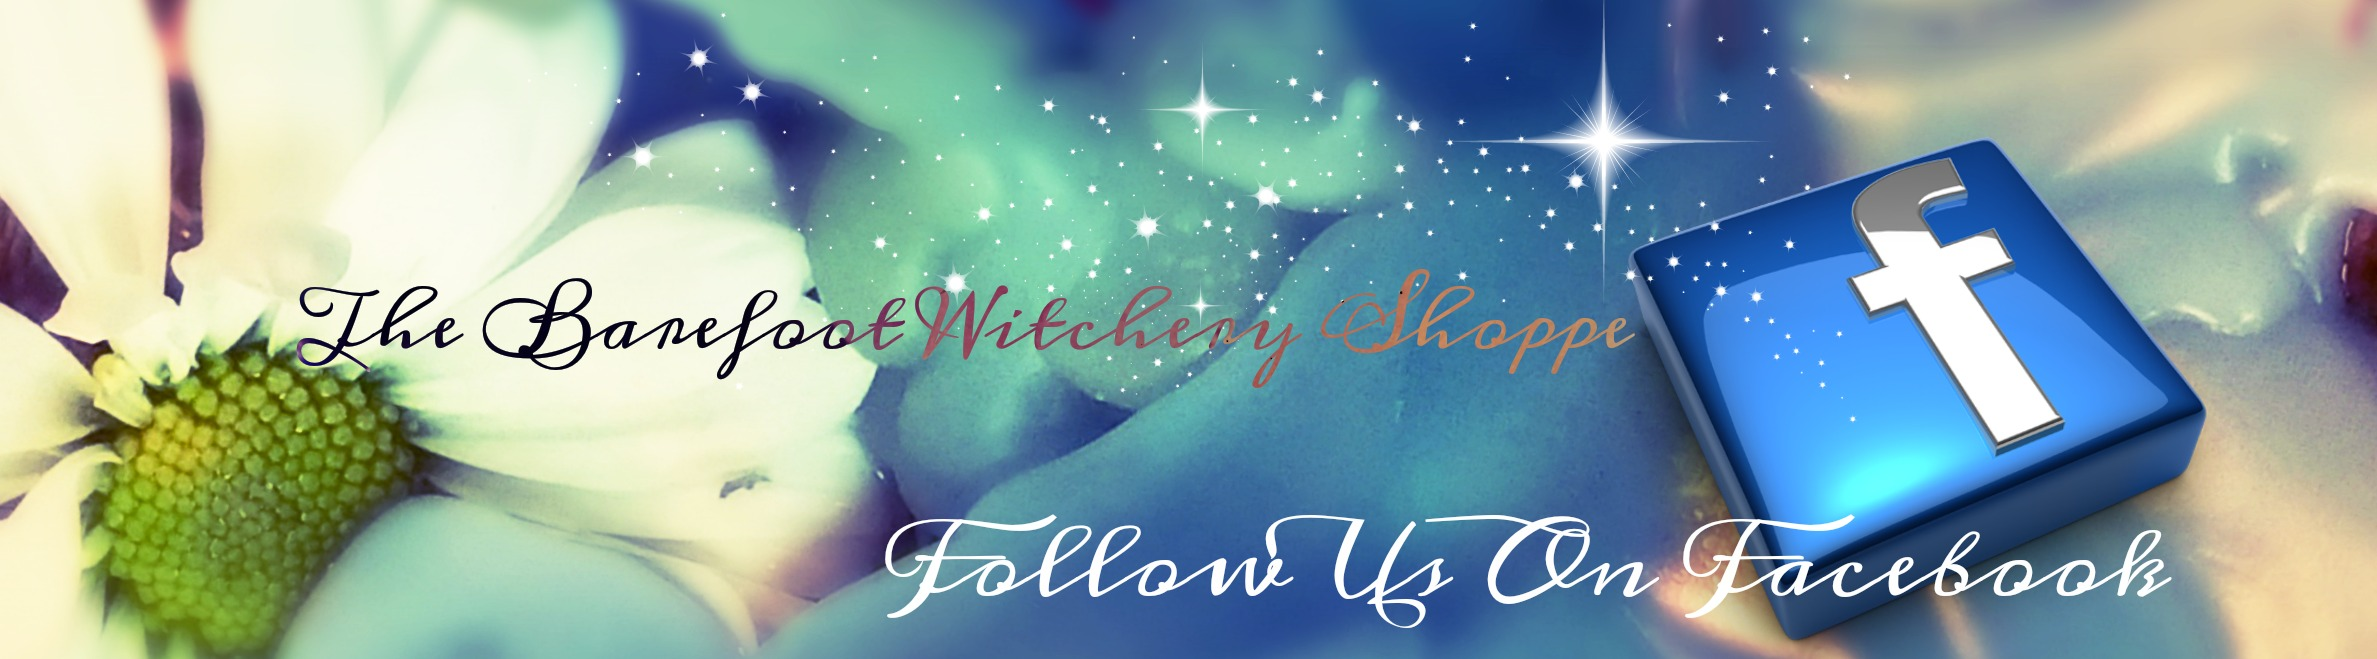 follow-us-on-facebook-banner2.jpg